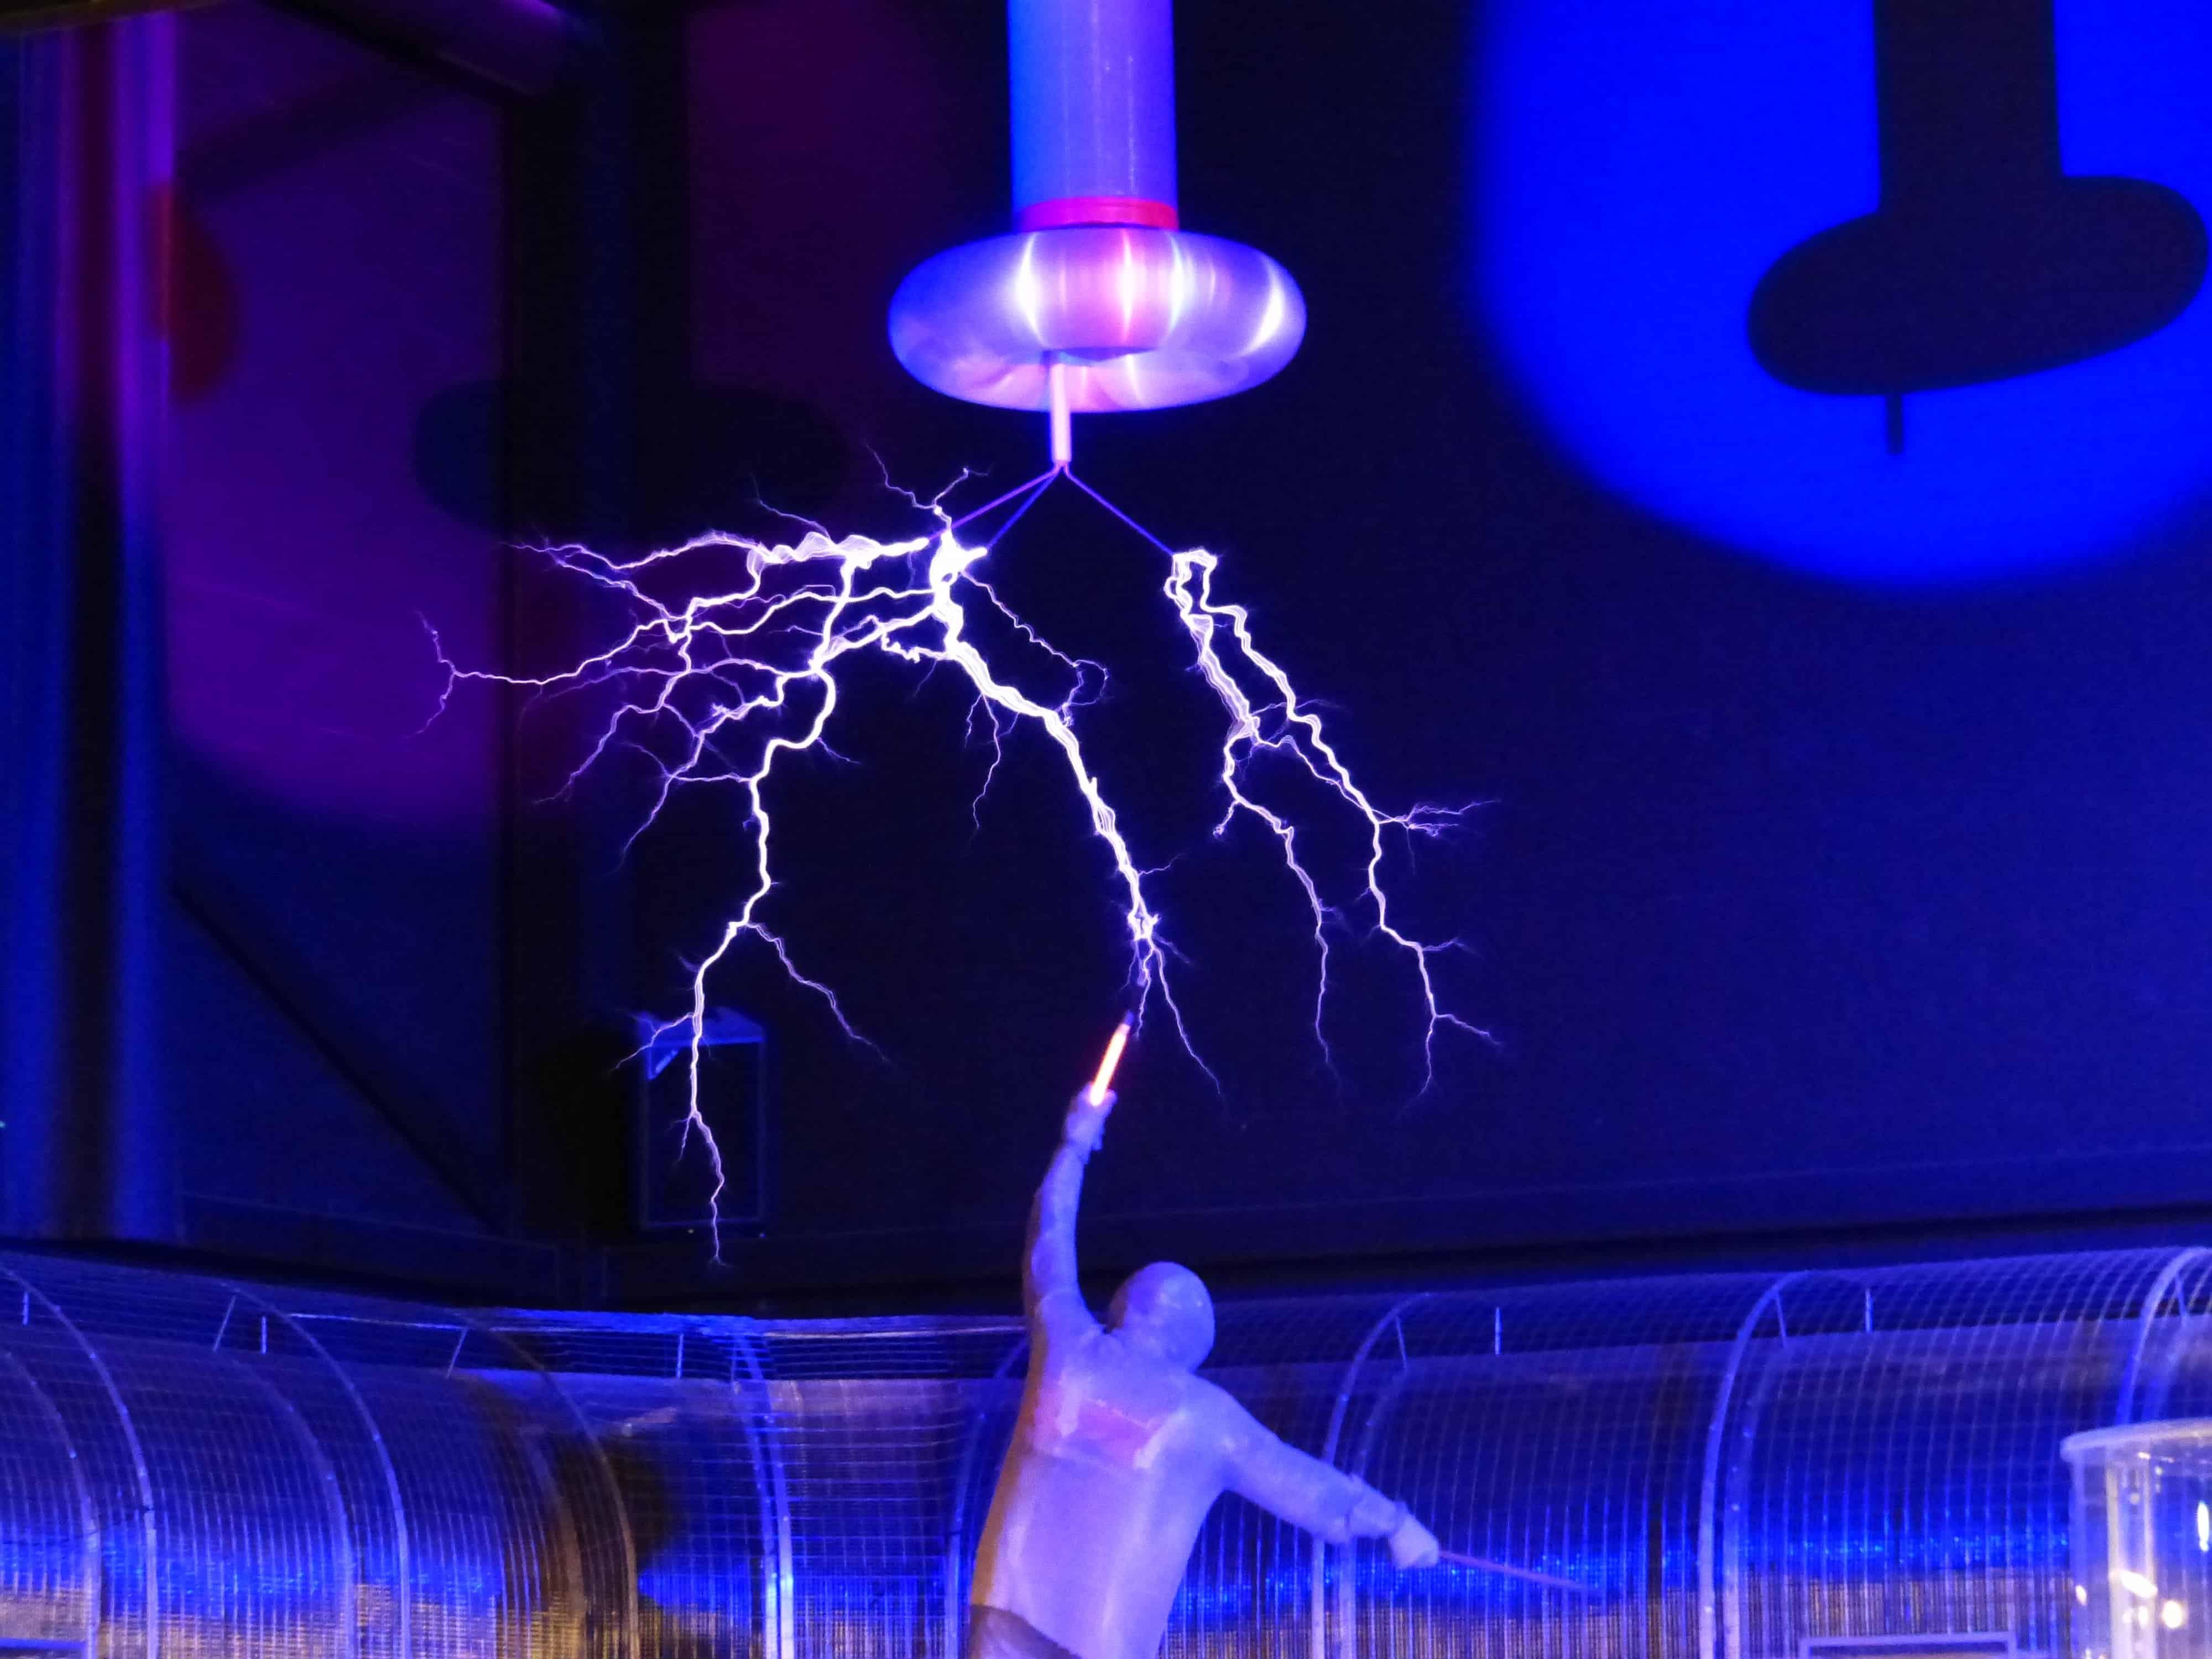 flash-tesla-coil-experiment-high-voltage-68481